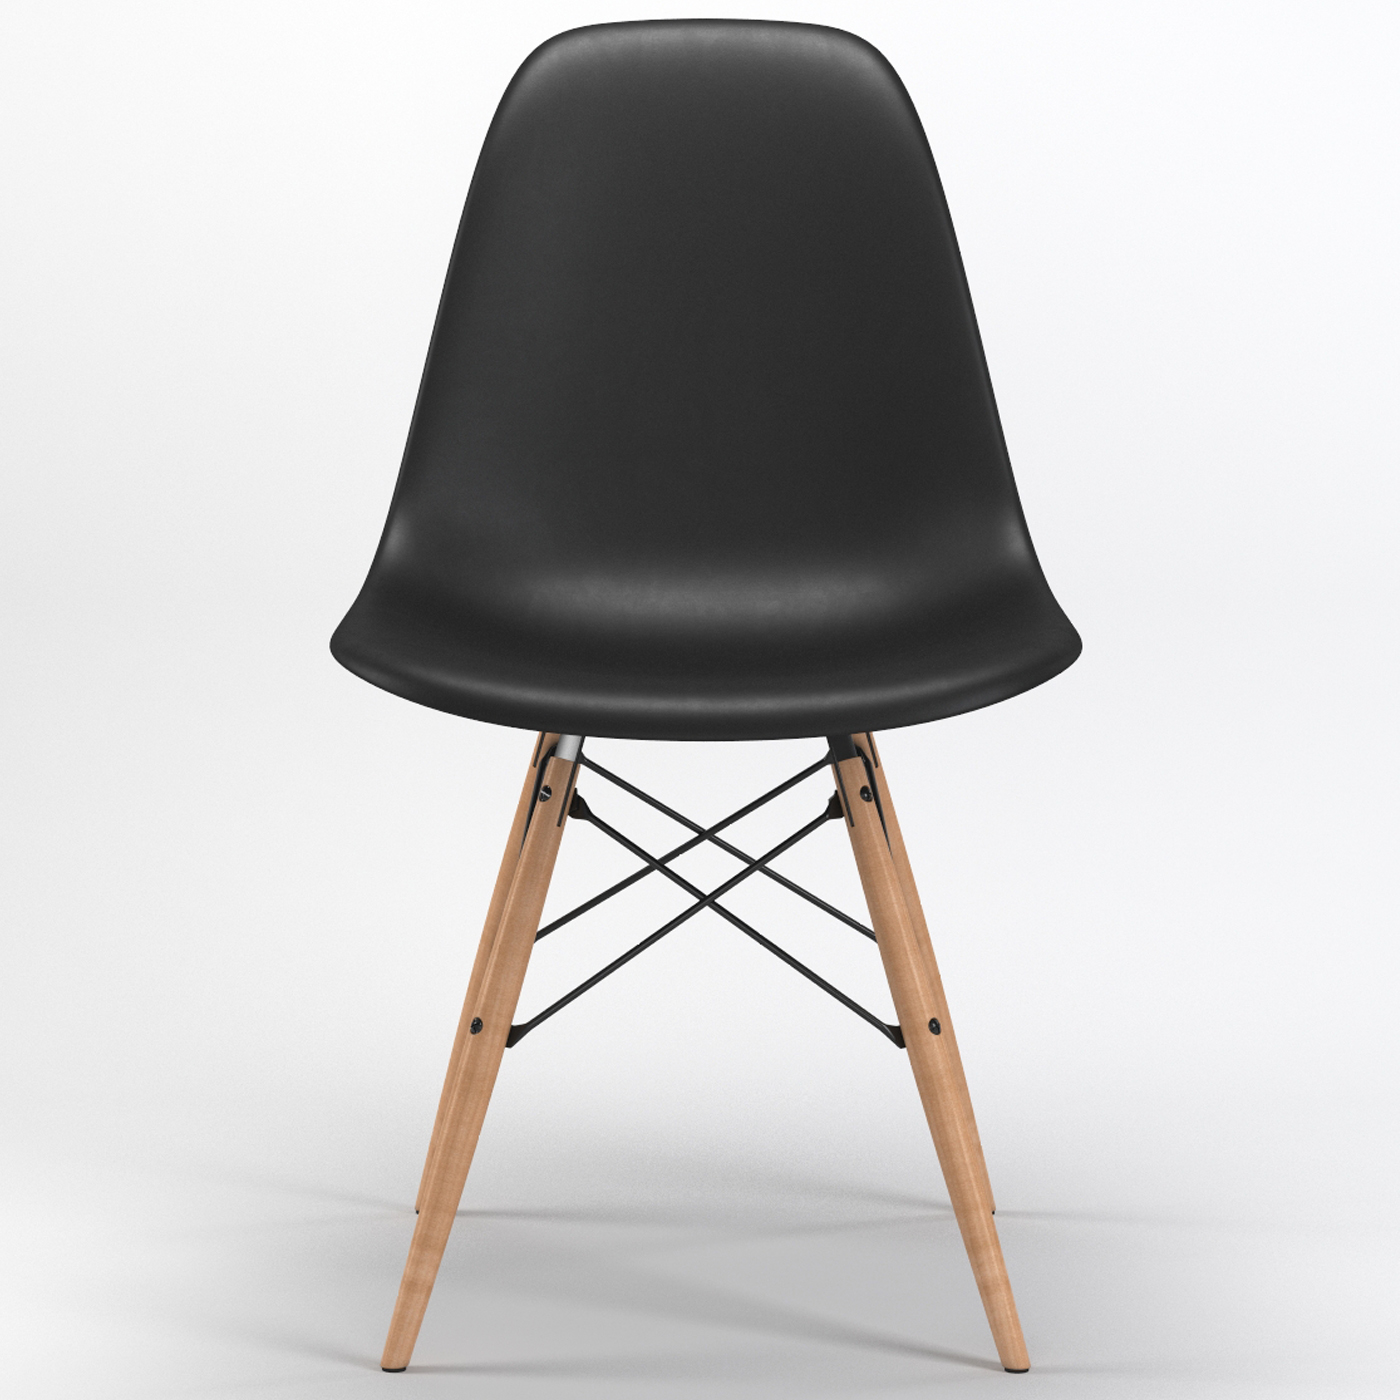 Wooden chair front view - Wooden Chair Front View 10